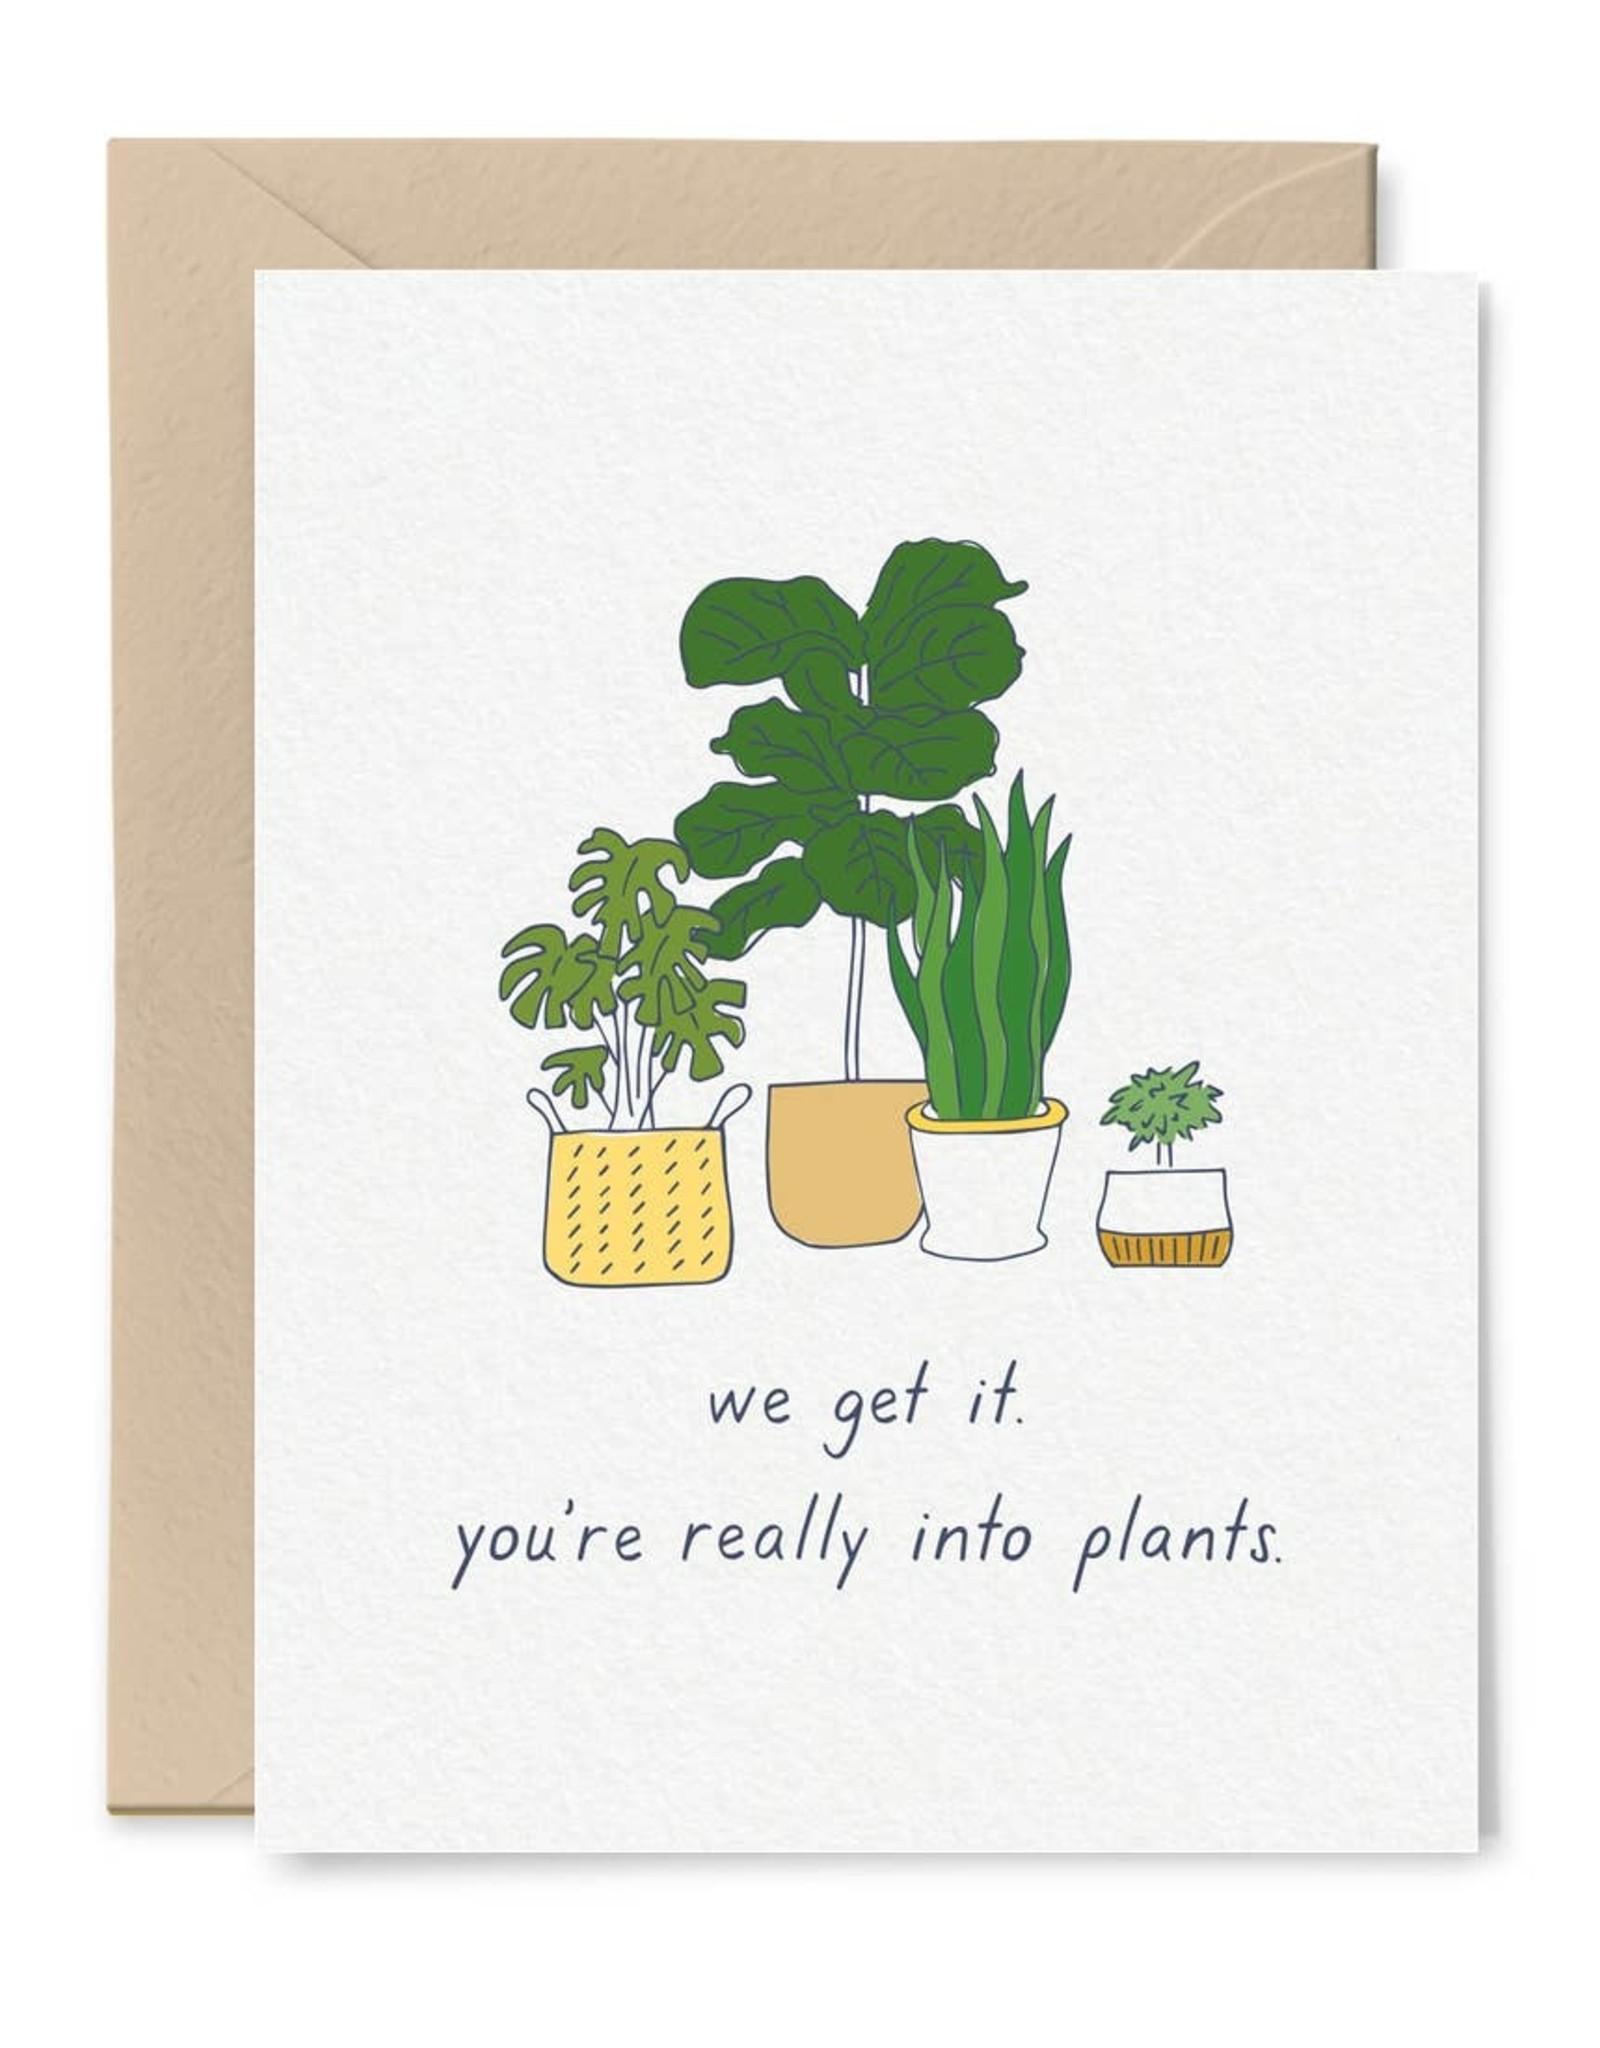 Little goat paper company Card - Blank: You like plants